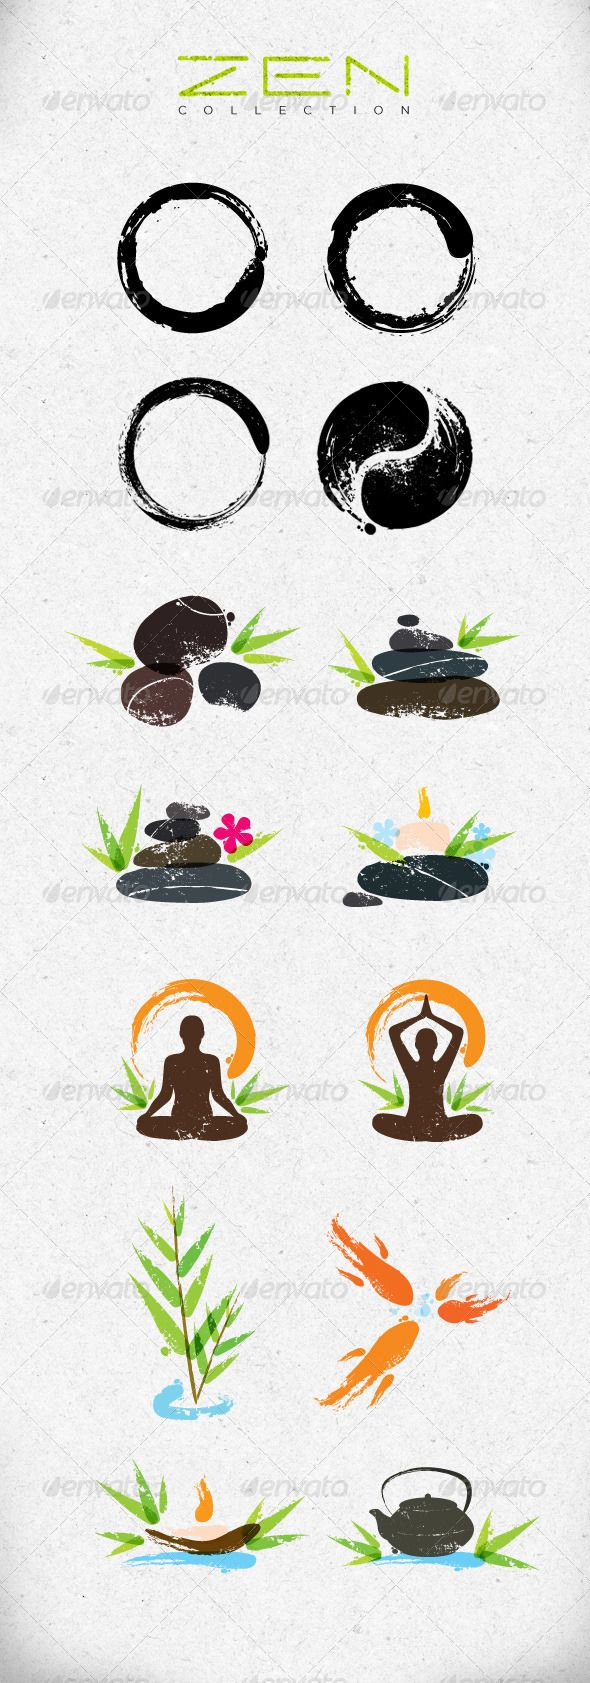 Zen Symbols Creative Vector Design Elements Set - GraphicRiver Item for Sale